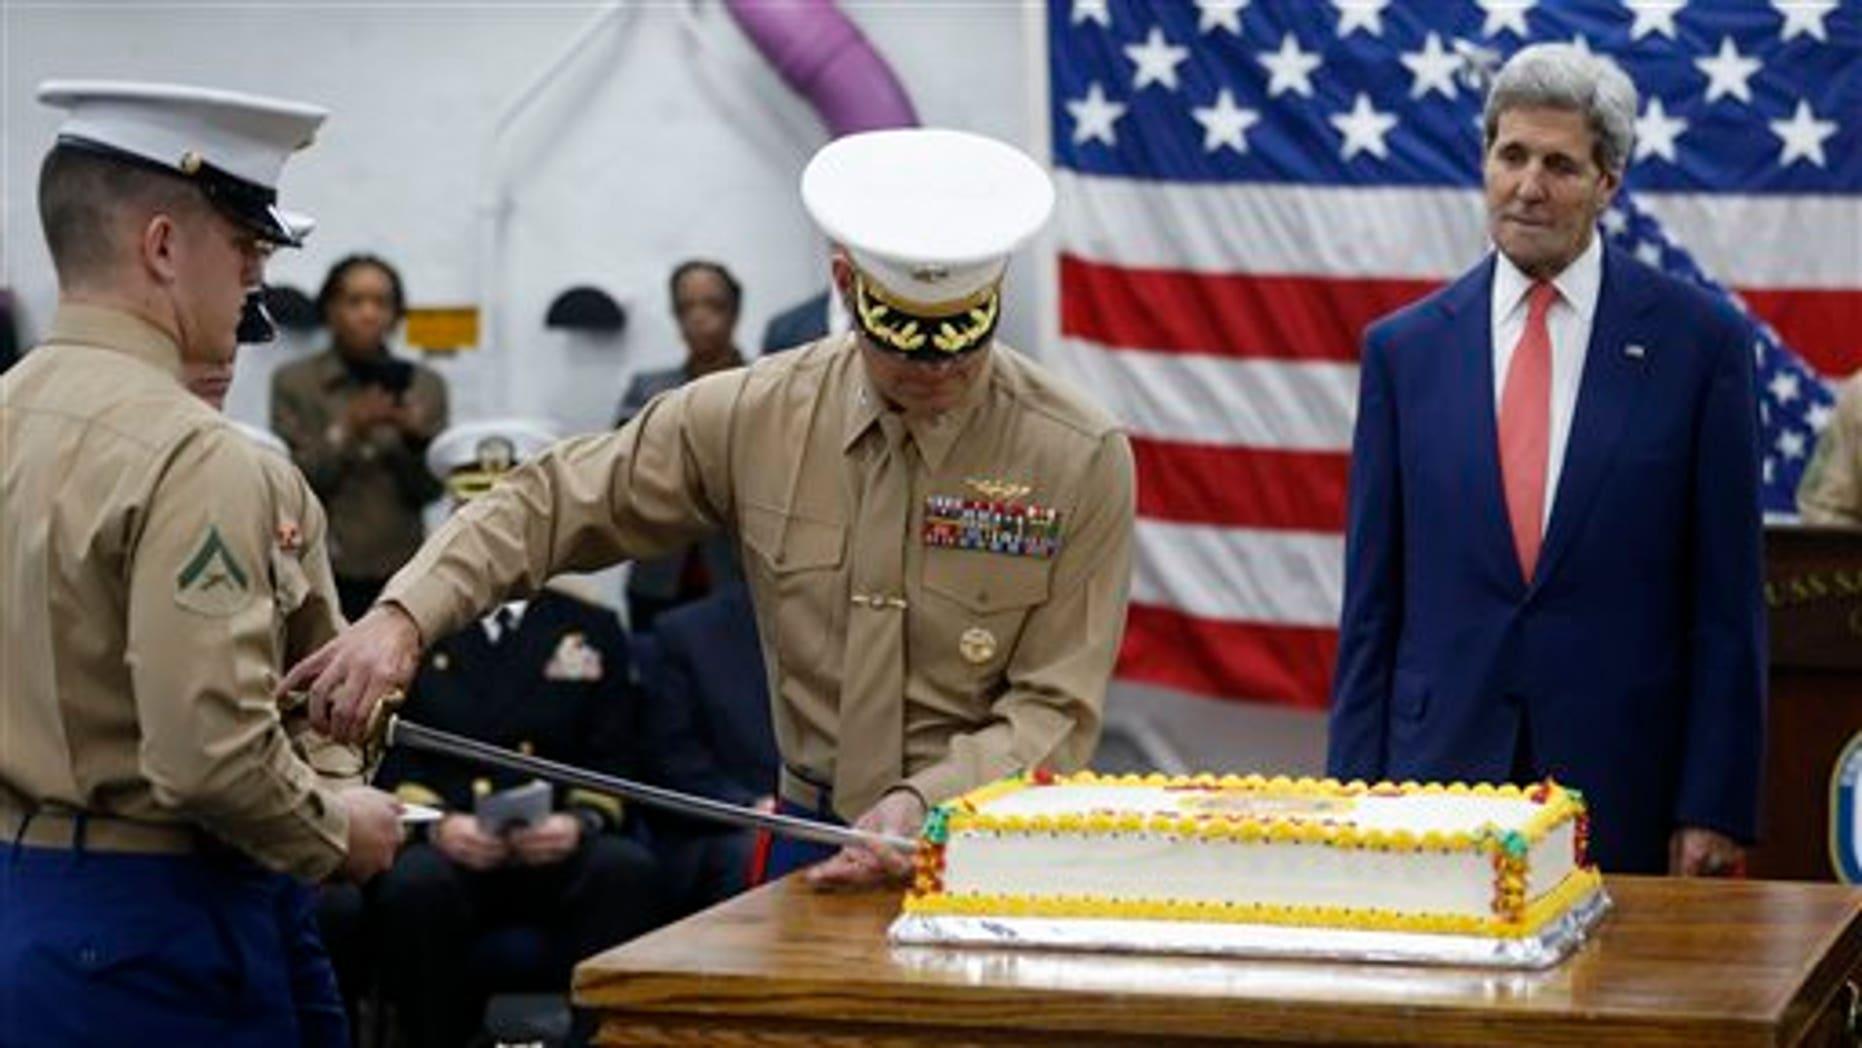 Celebrations aboard the USS San Antonio.